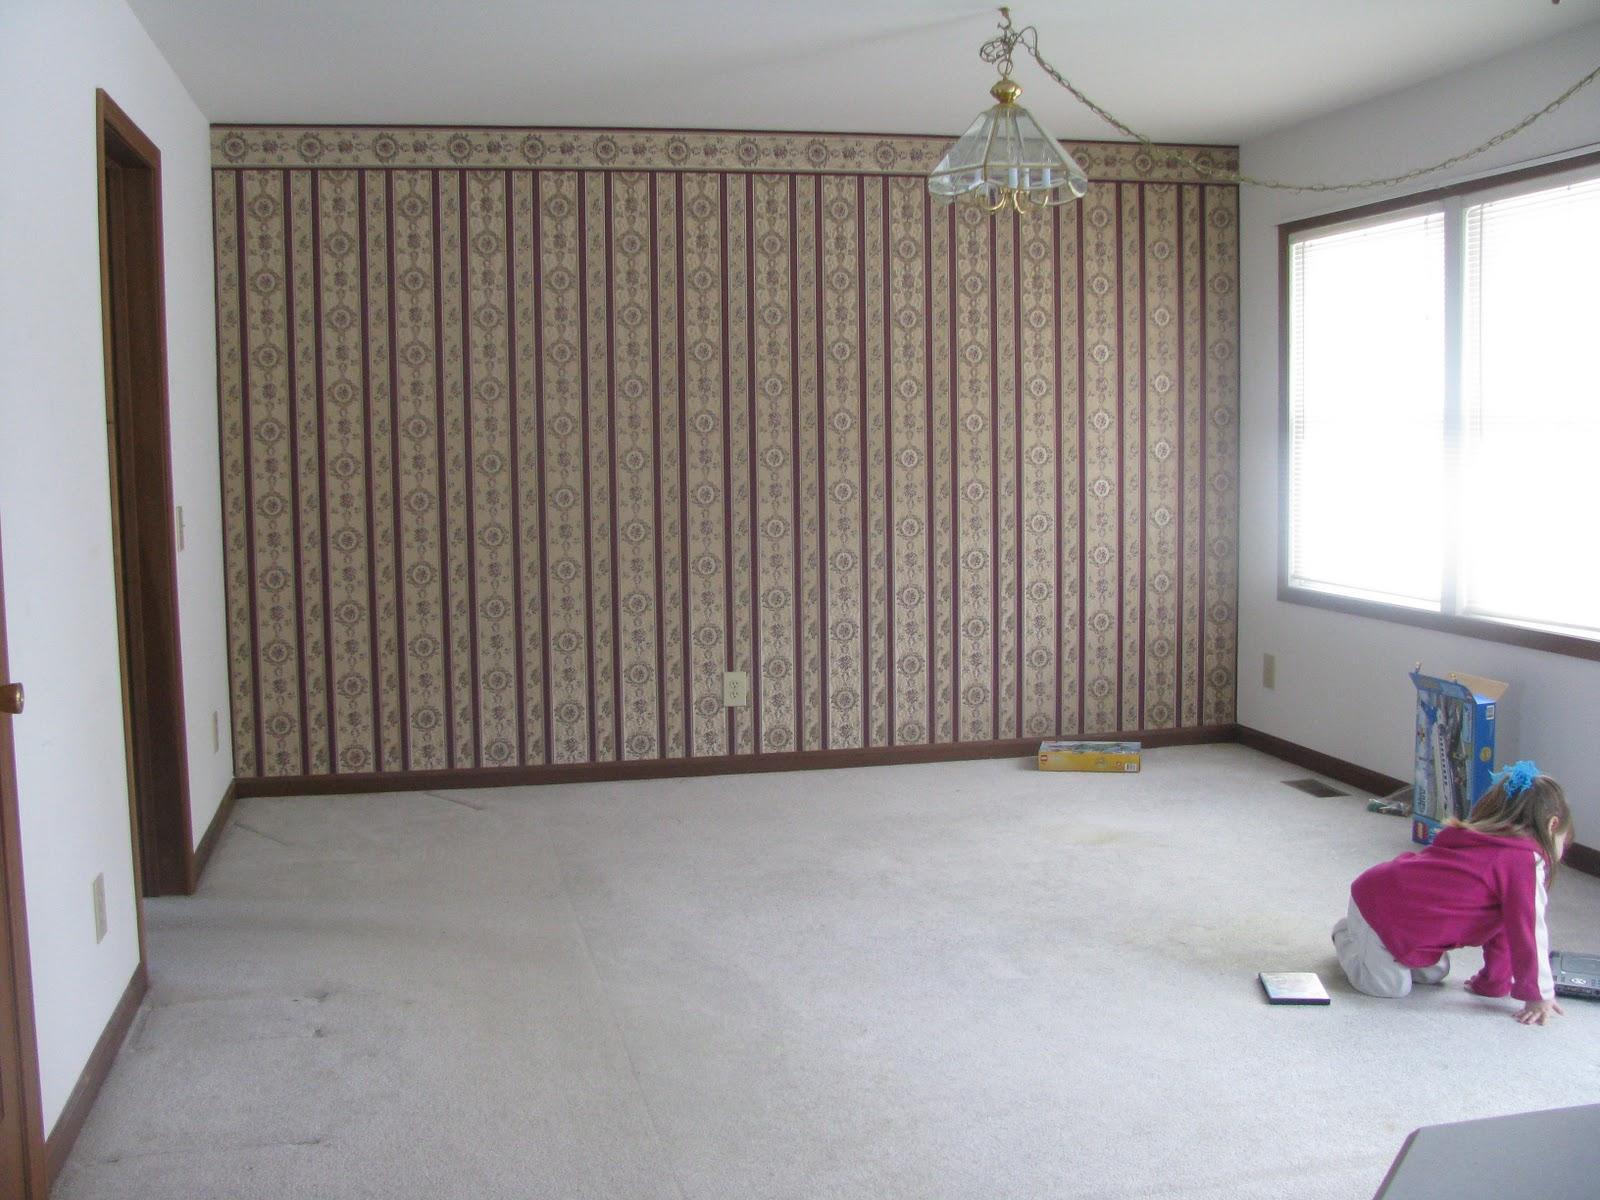 http://2.bp.blogspot.com/_1paShxZgTSo/TRftBD8ty7I/AAAAAAAADCY/qKVKRjhbuvk/s1600/dining+room+before.JPG